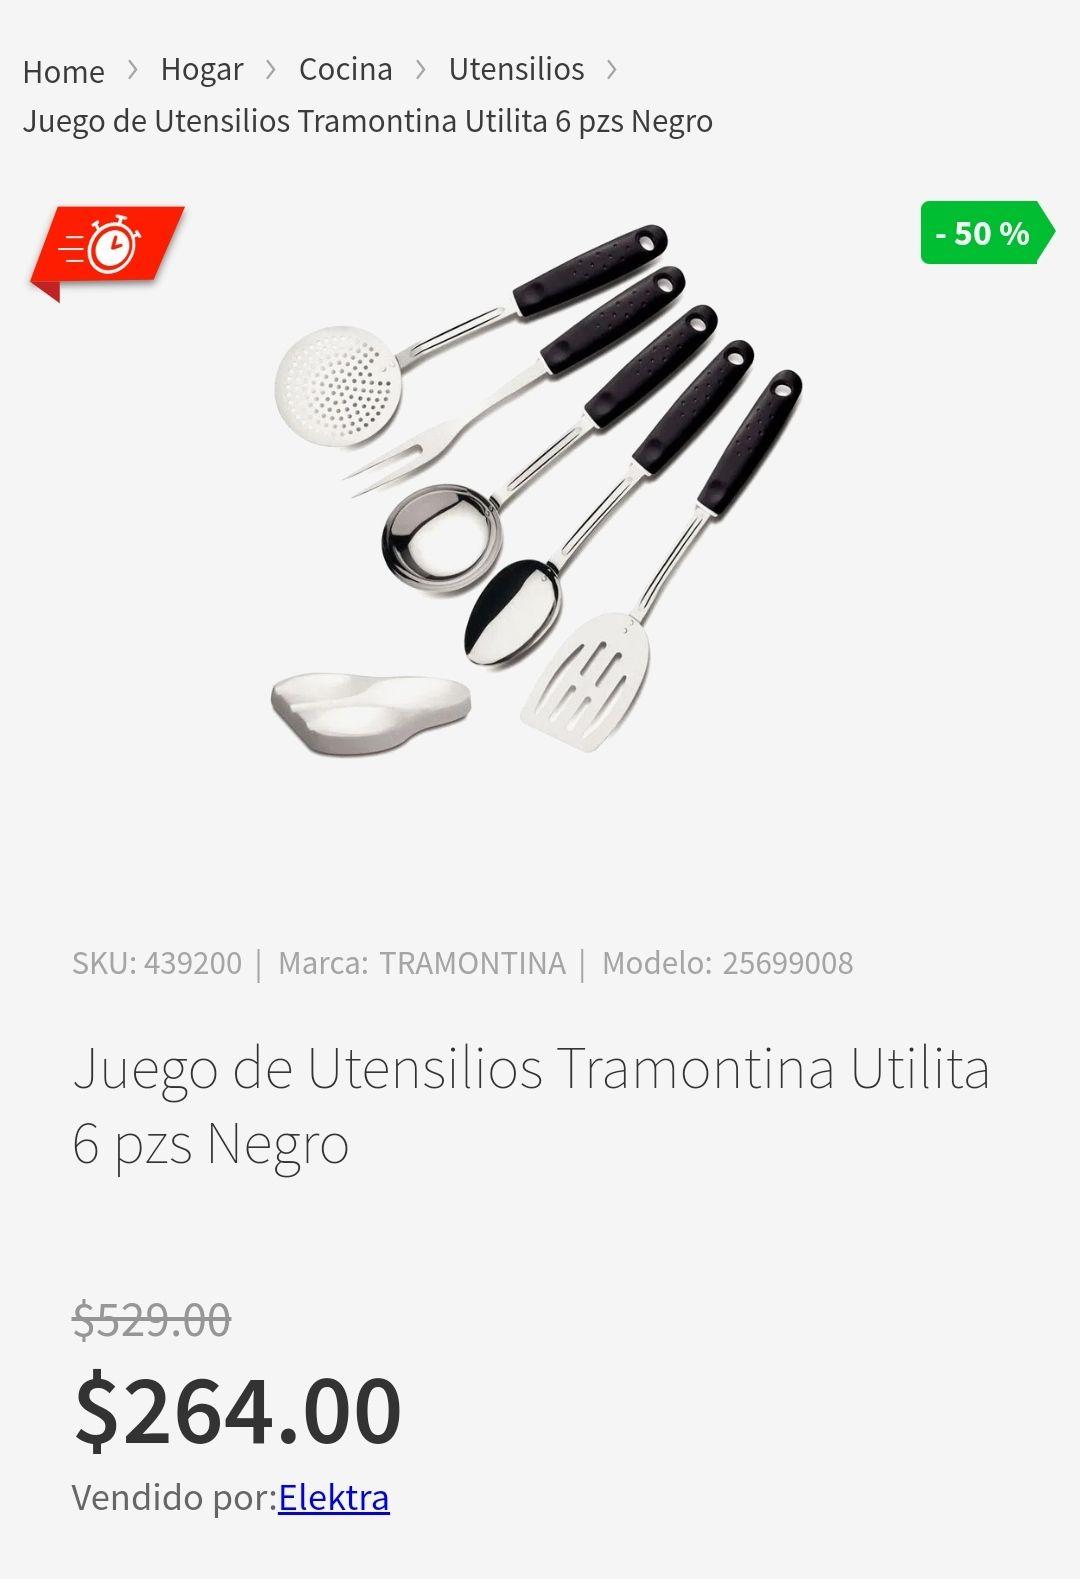 Elektra Juego de Utensilios Tramontina Utilita 6 pzs Negro